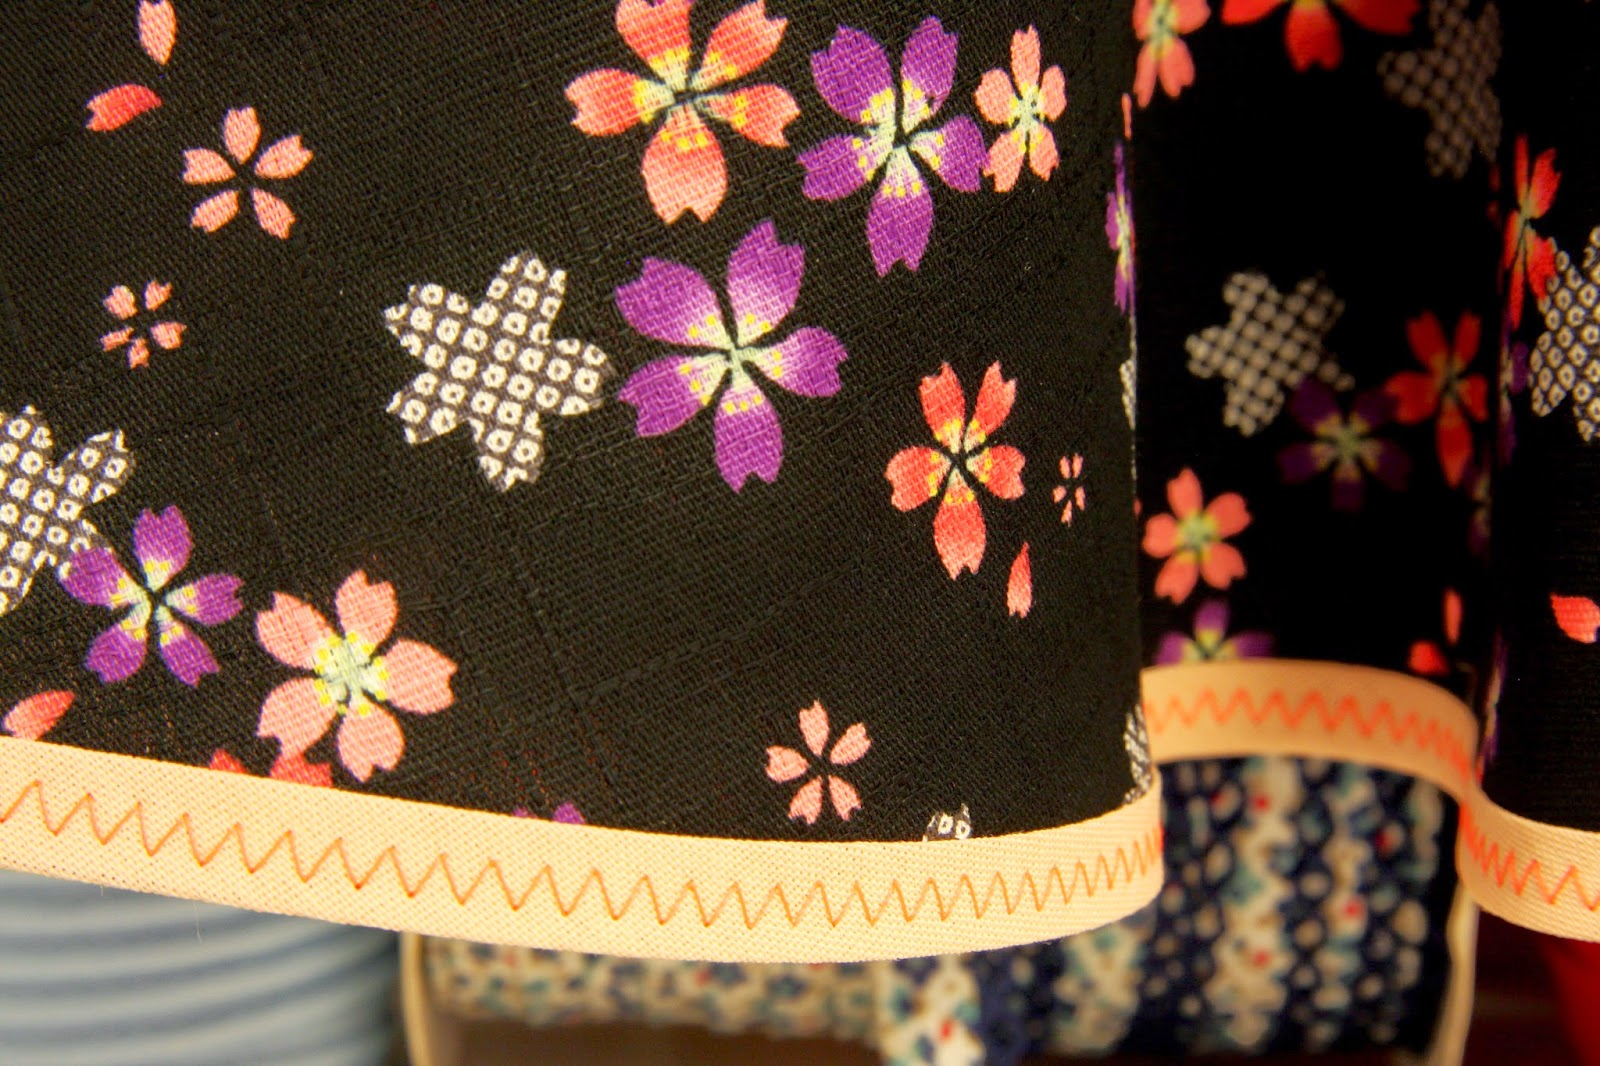 Nederdelen er kantet med laksefarvet skråbånd som har fået zigzag pyntestikning med neonsytråd.